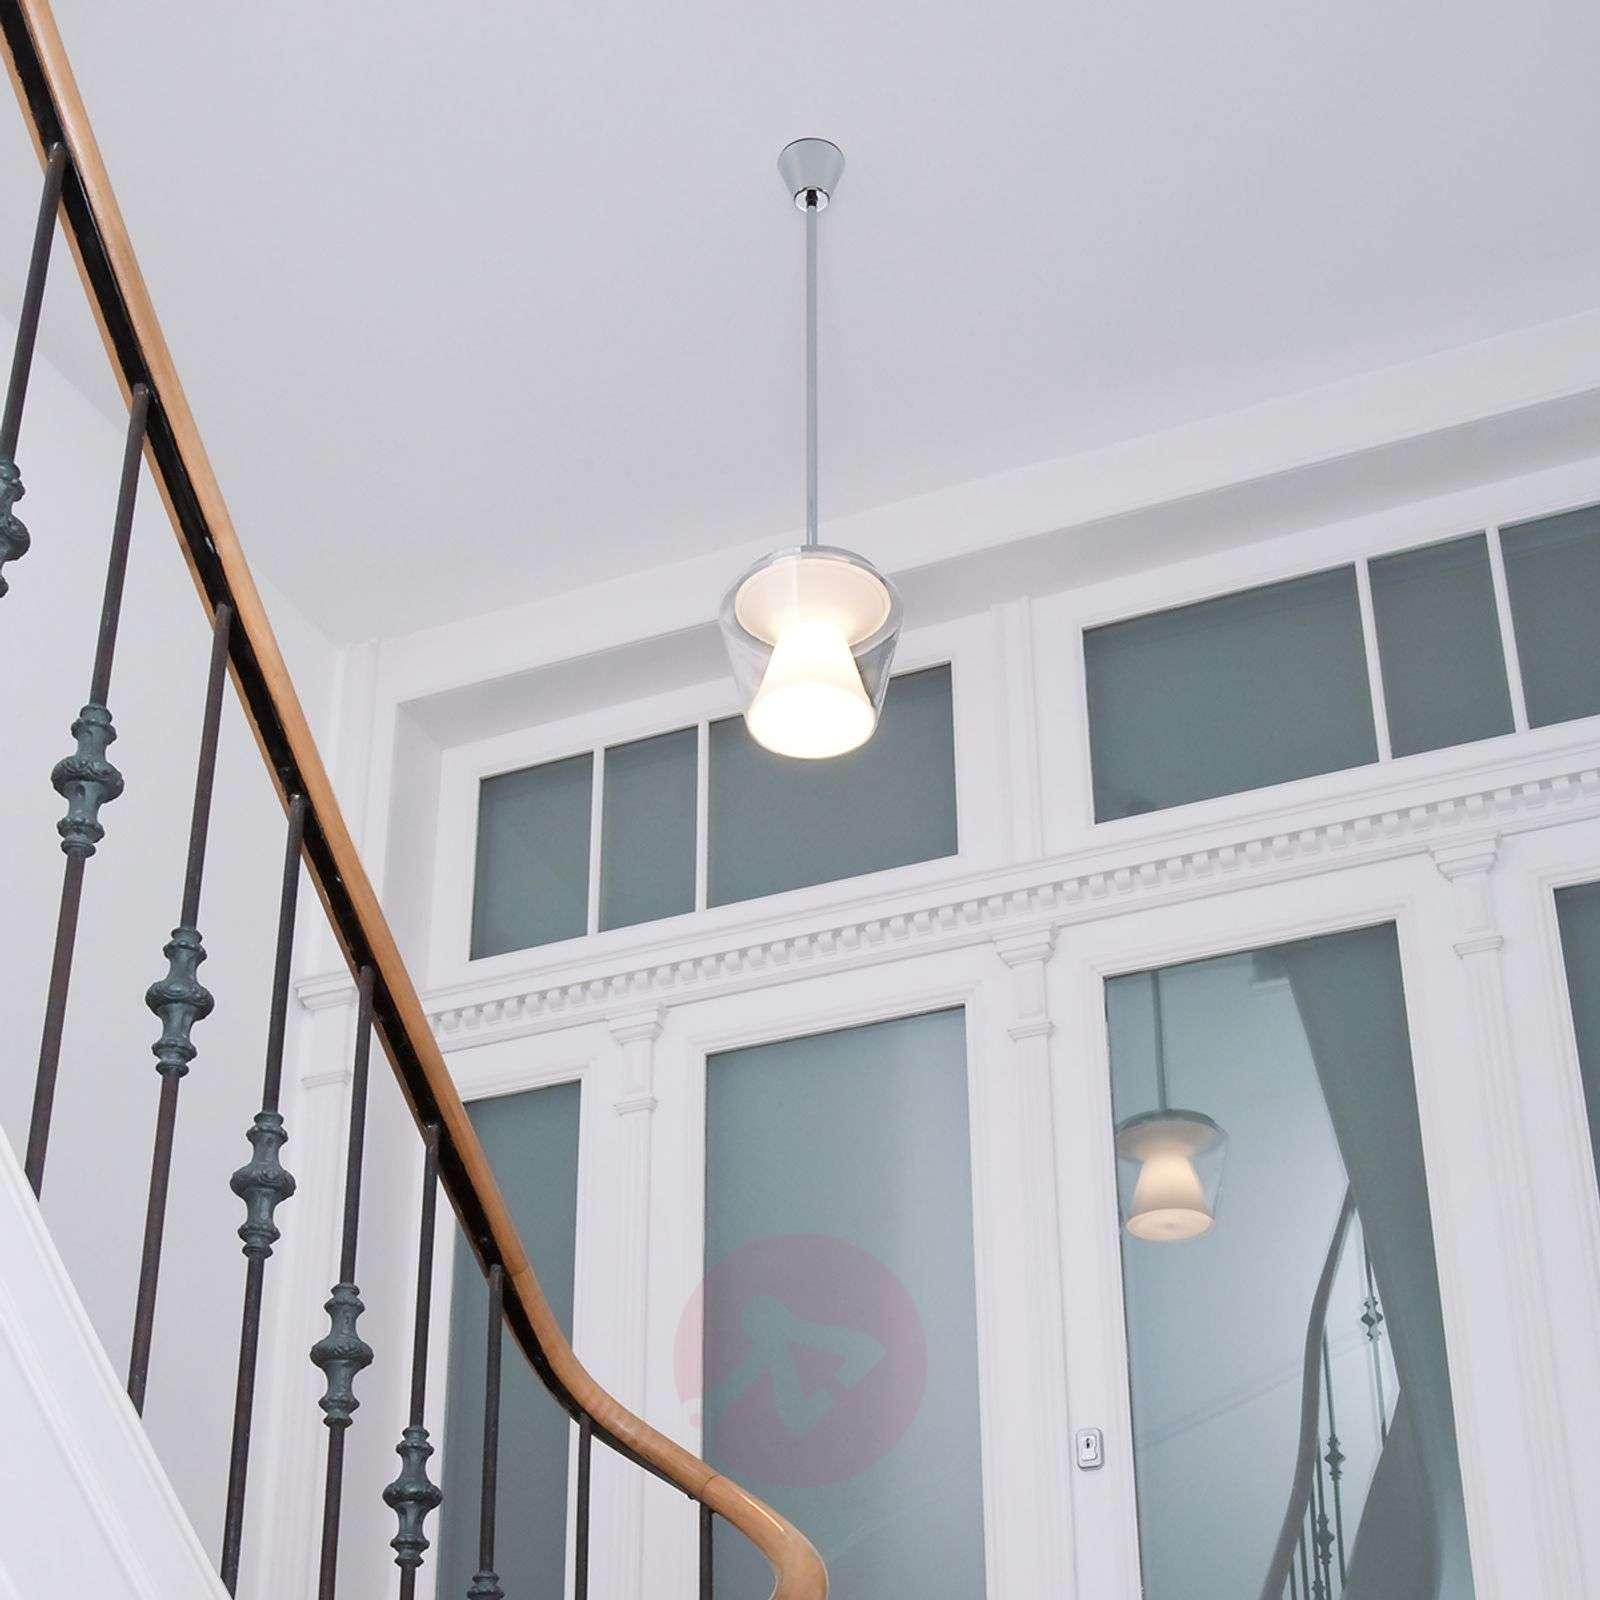 LED-design-riippuvalaisin Annex lasivarjostimella-8550047-01